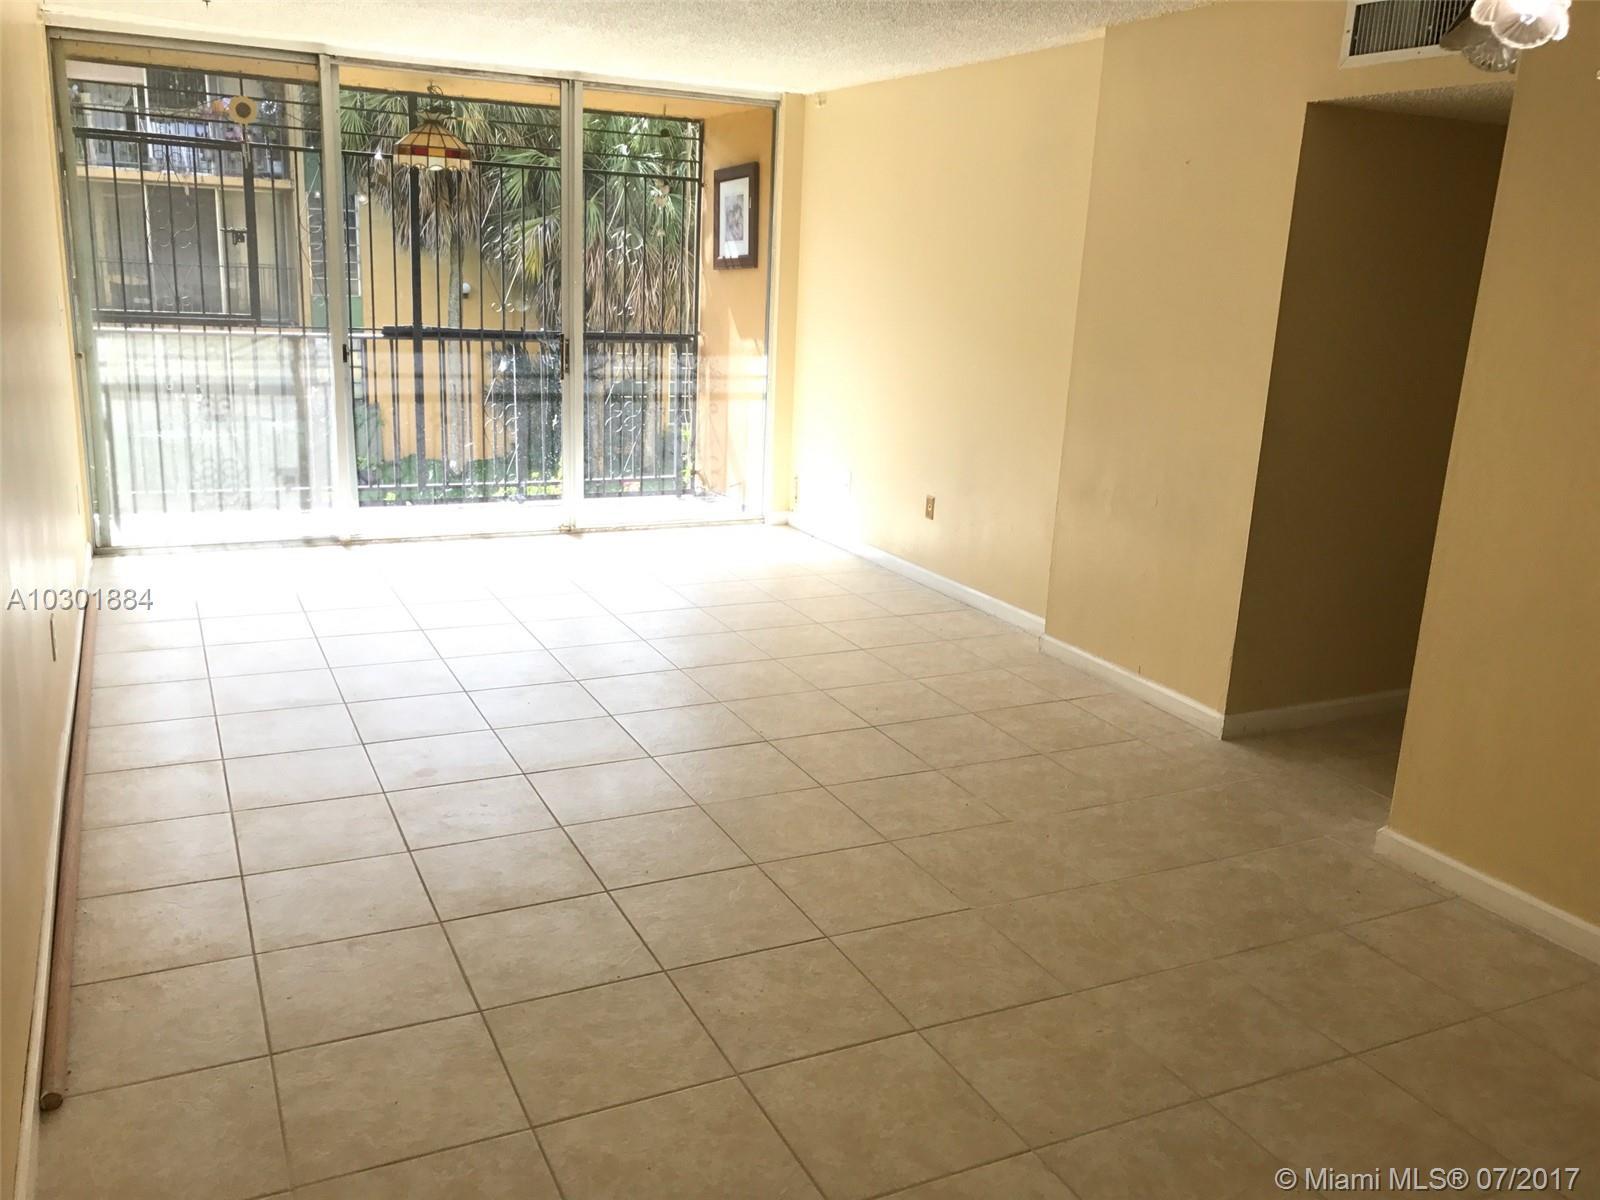 8841 W Flagler St # 202, Miami, FL 33174